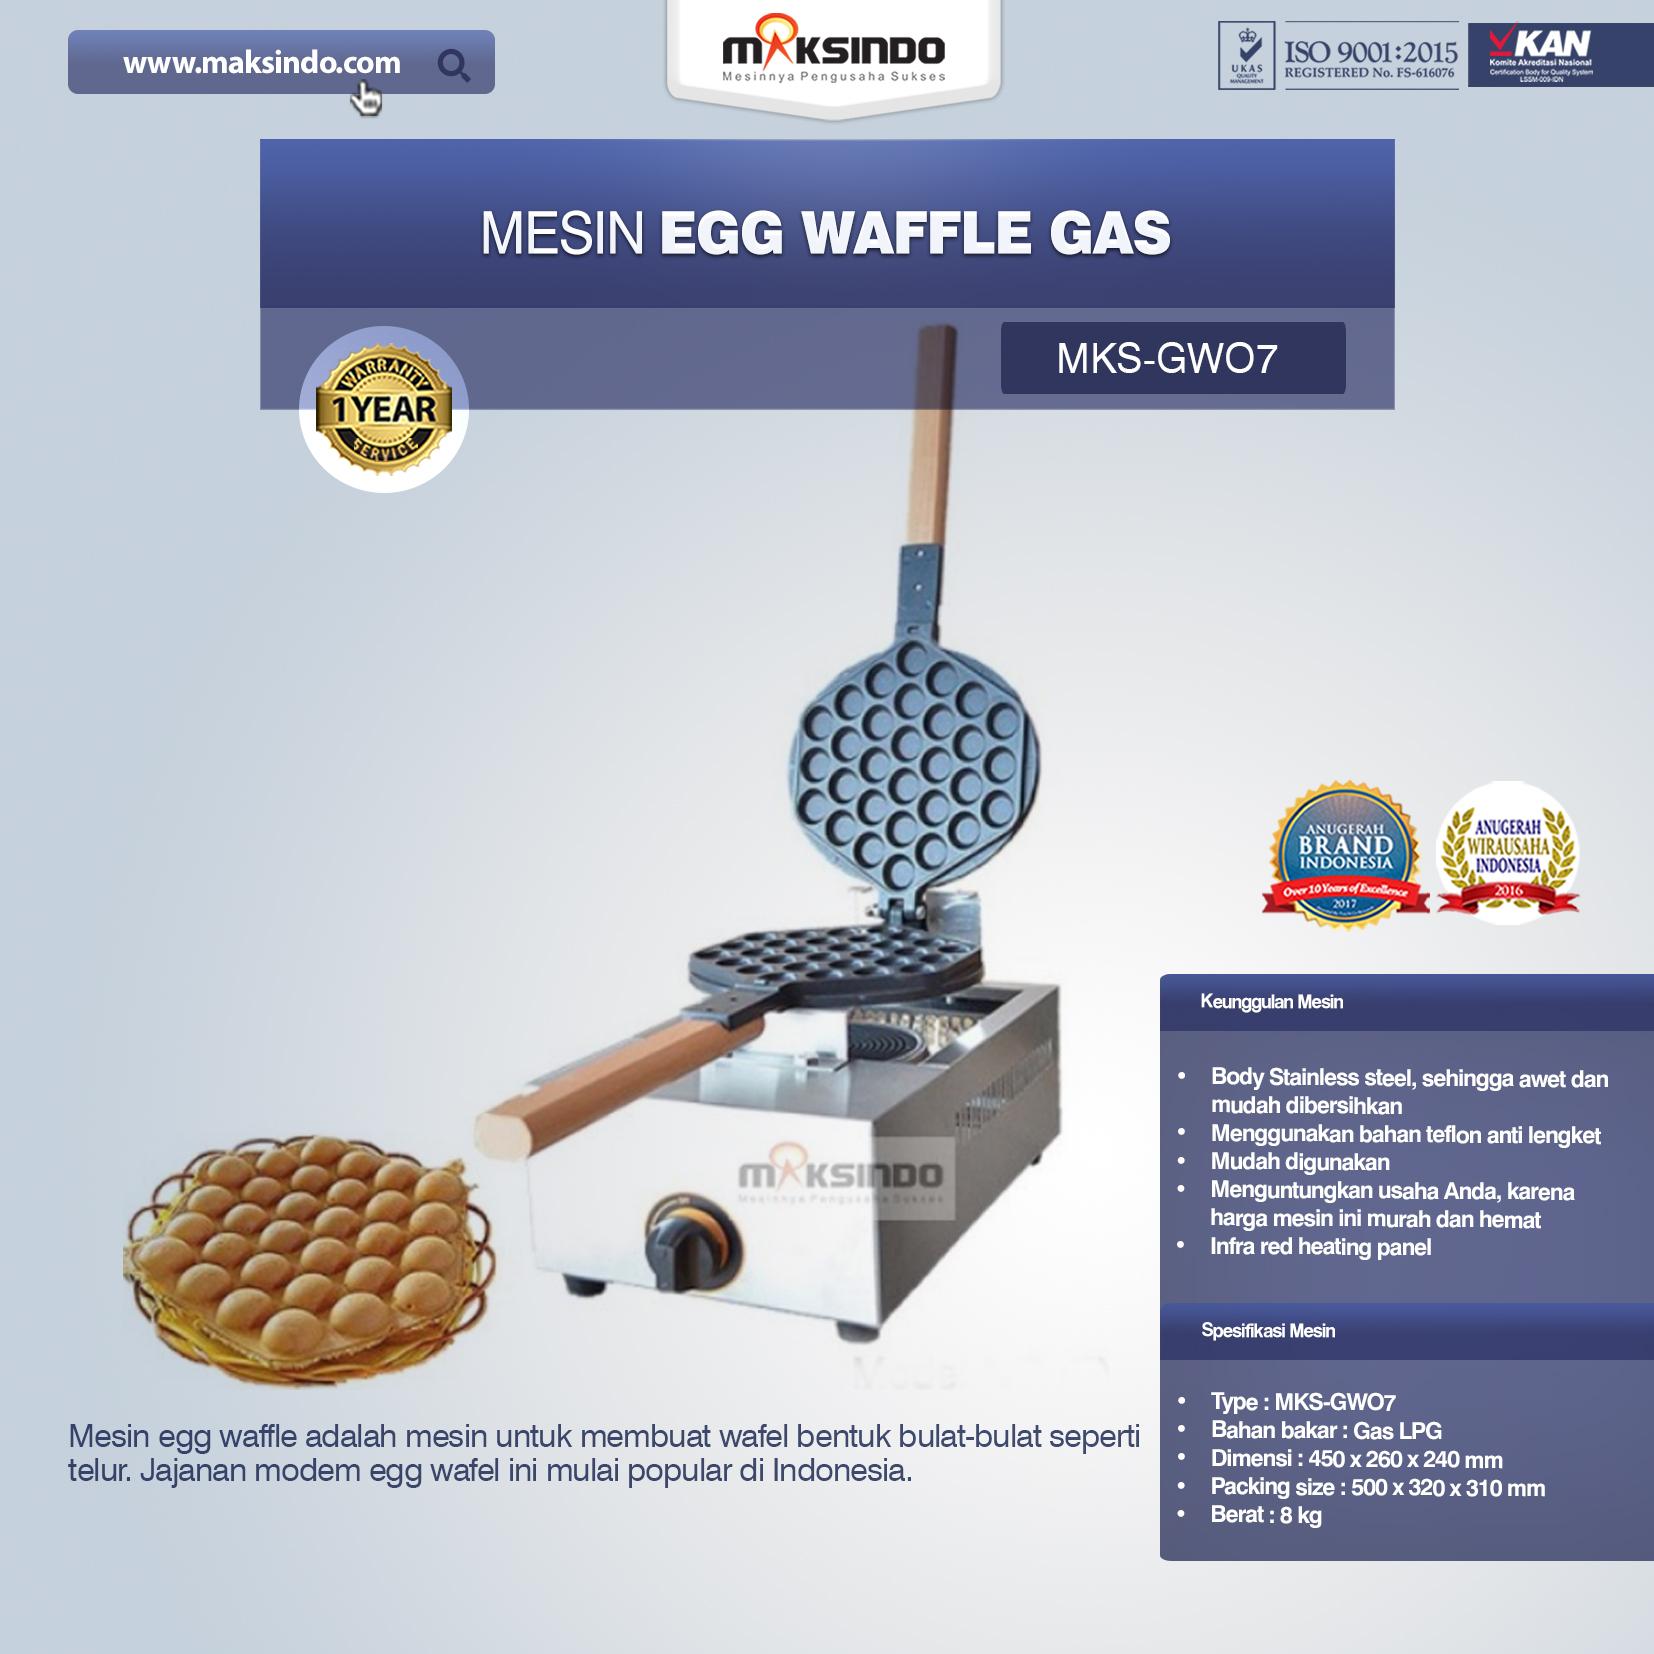 Jual Mesin Egg Waffle Gas (GW07) di Palembang